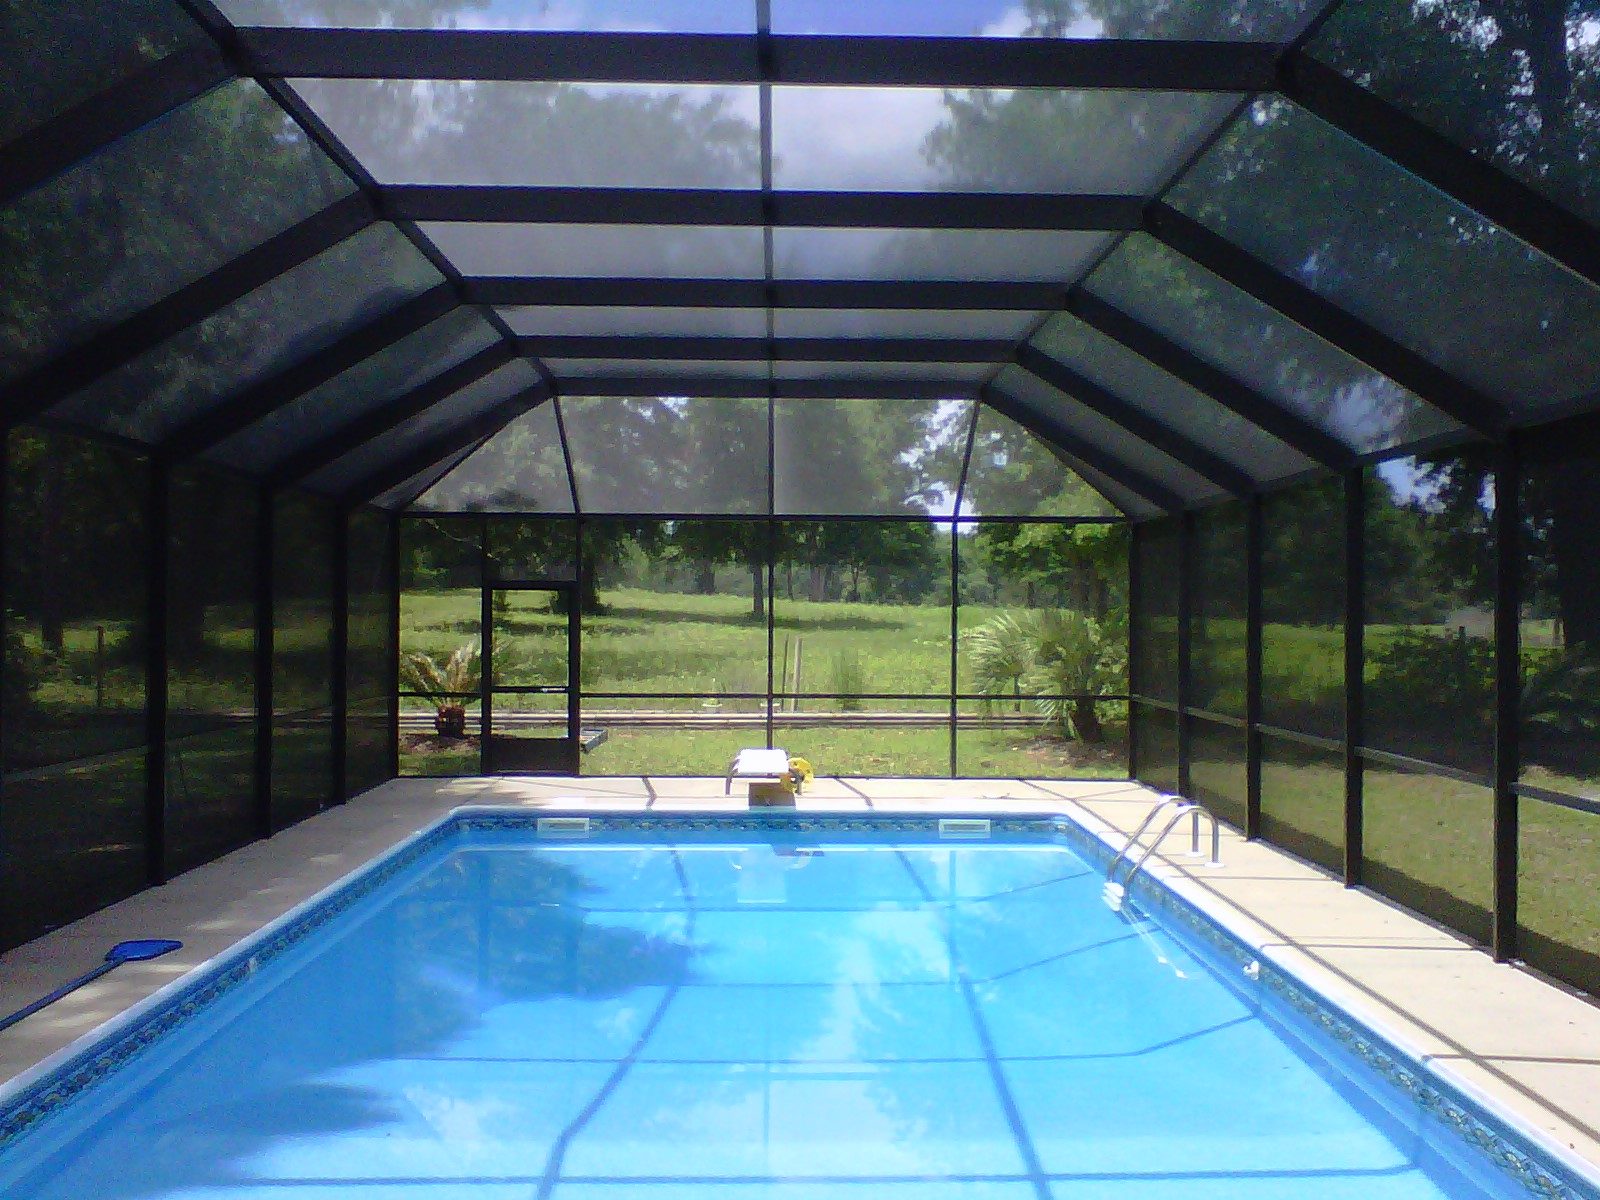 Pool enclosures usa estimating pool enclosure costs - Swimming pool screen enclosures cost ...